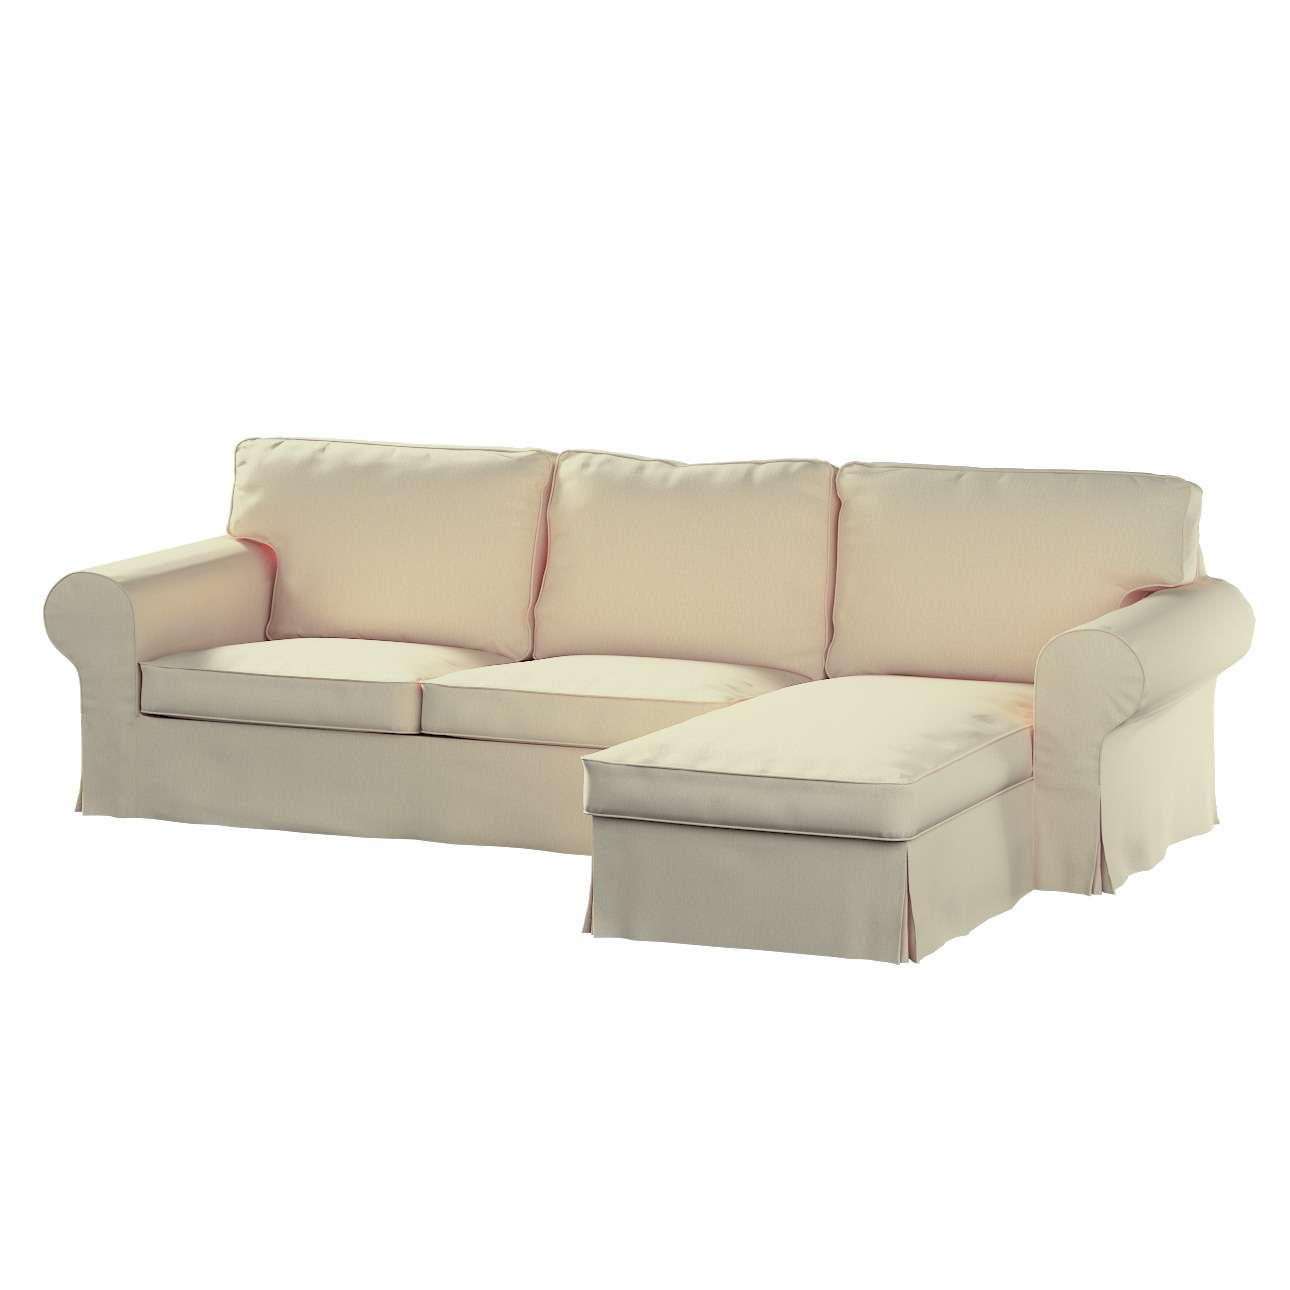 Ektorp 2-Sitzer Sofabezug mit Recamiere Ektorp 2-Sitzer Sofabezug mit Recamiere von der Kollektion Chenille , Stoff: 702-22